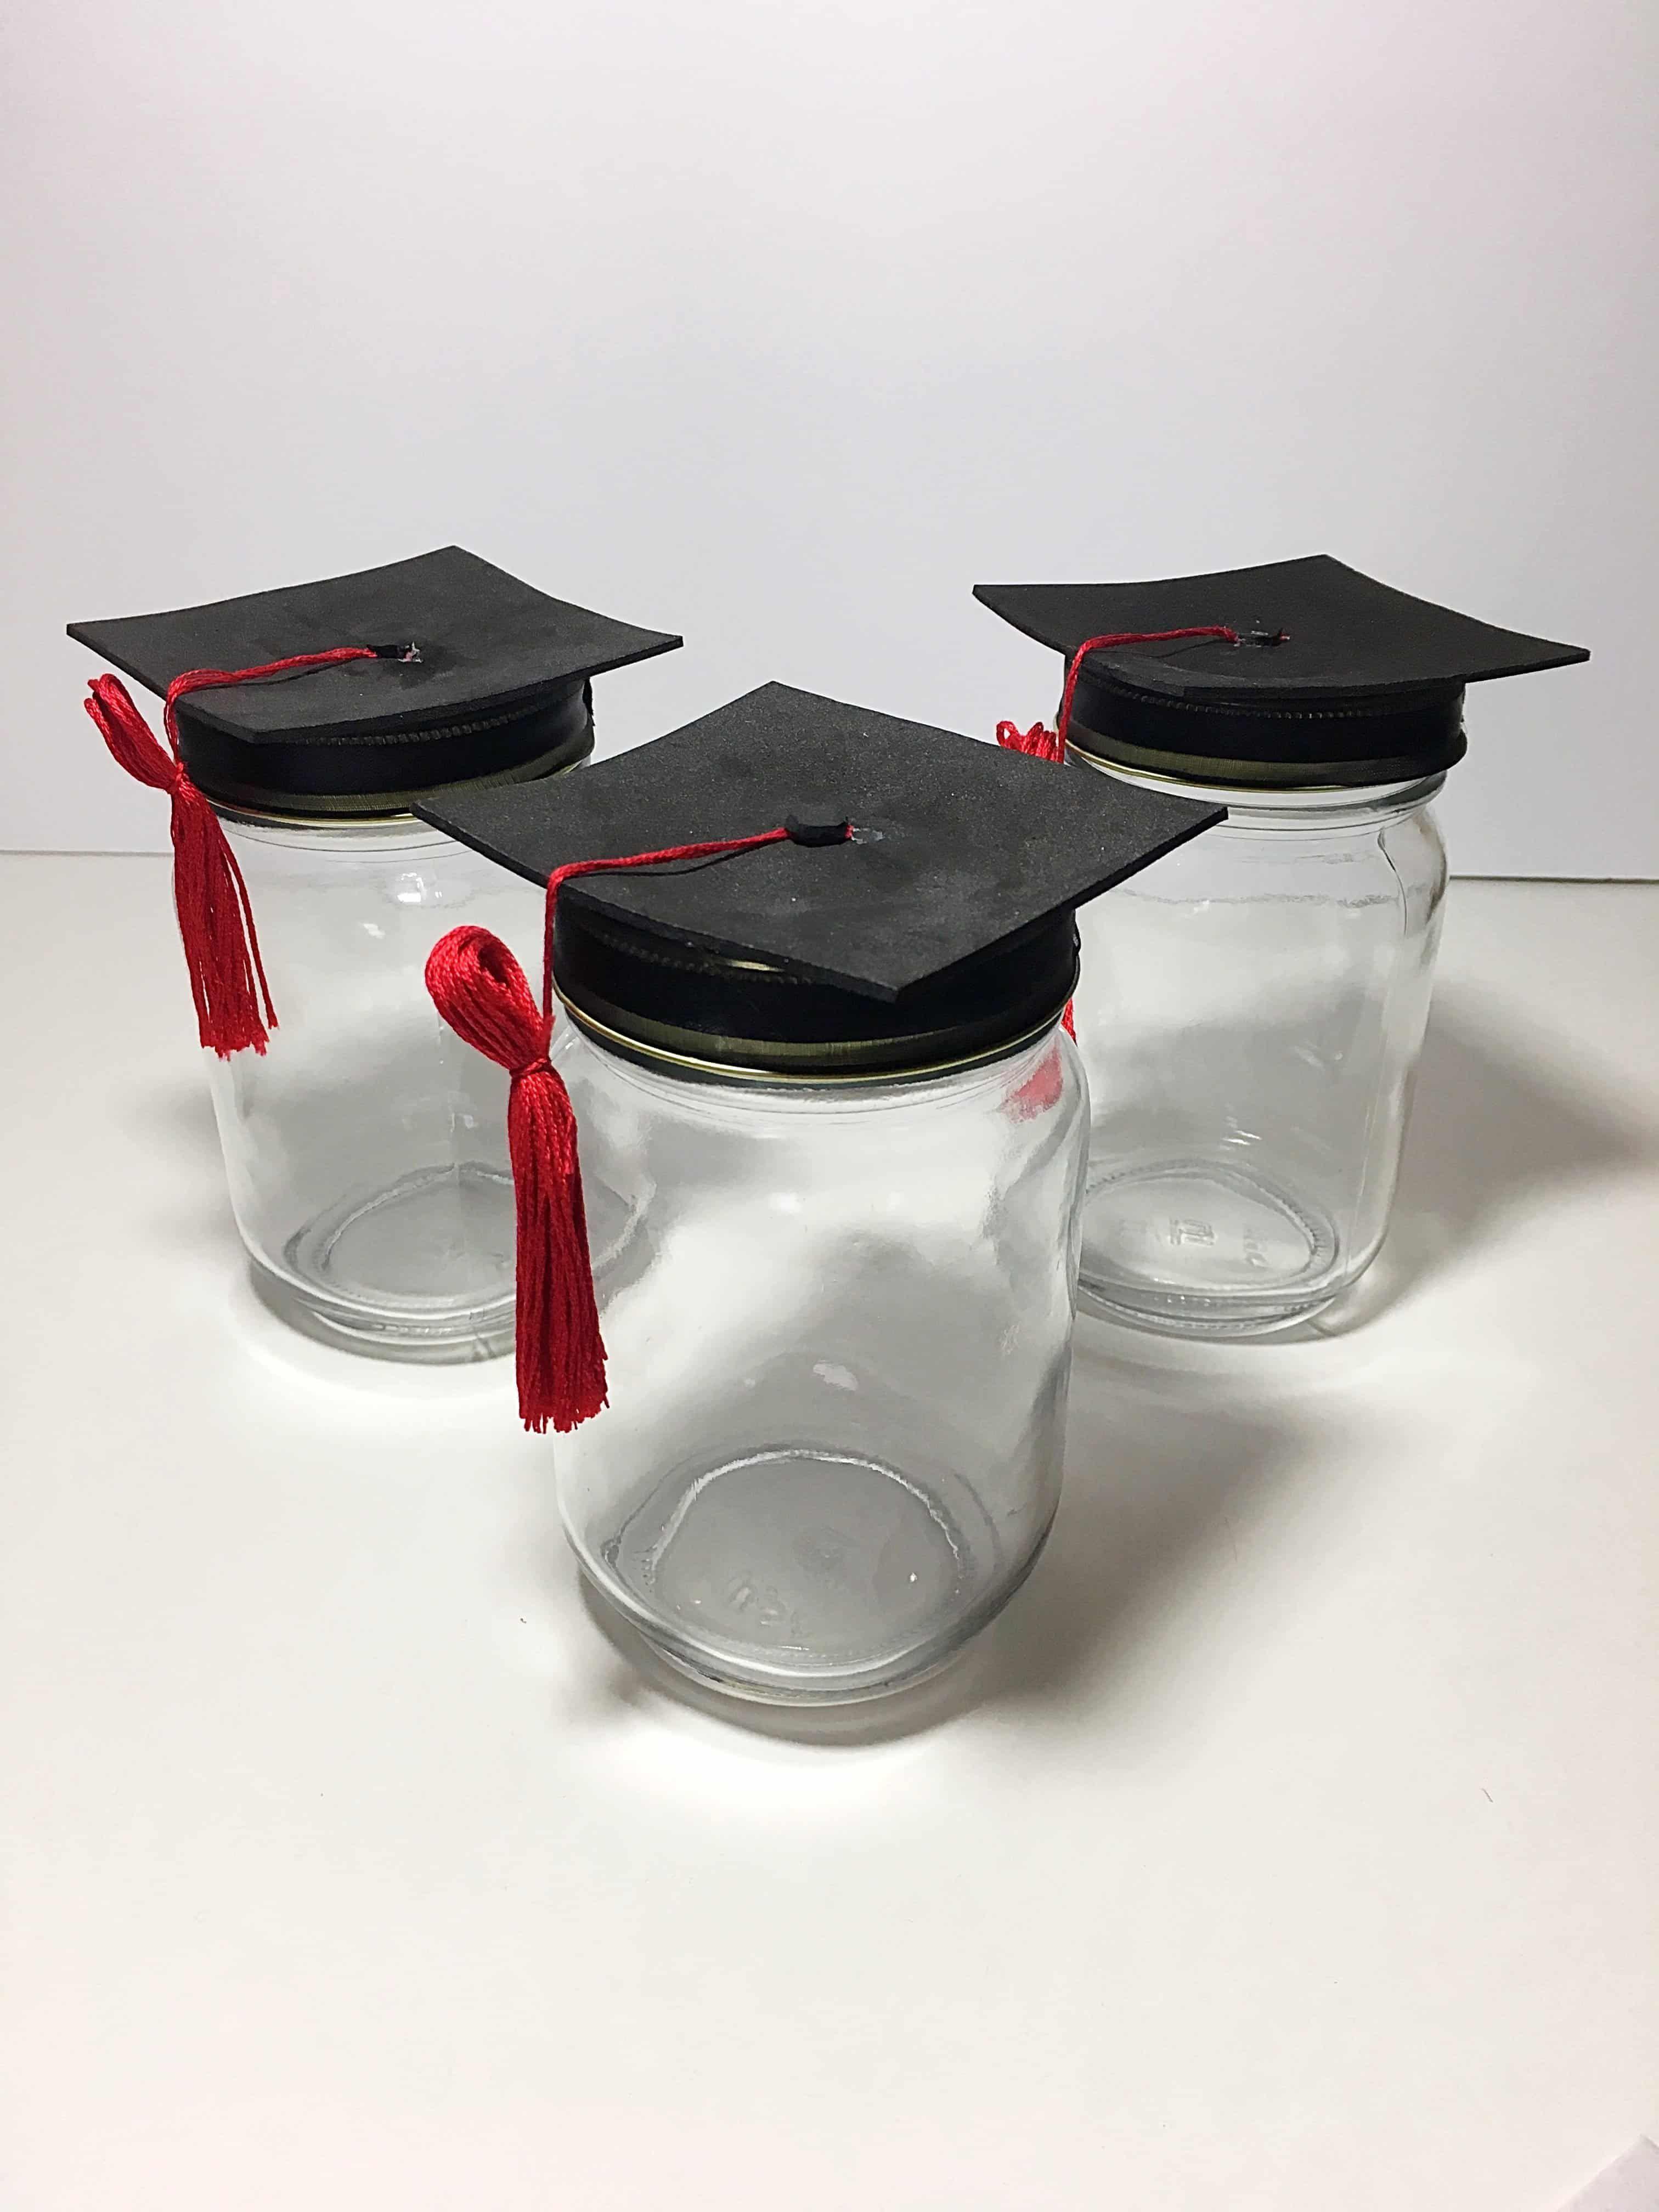 Diy Adorable Graduation Cap Mason Jars Graduation Gifts For Friends Diy Graduation Gifts Graduation Mason Jars